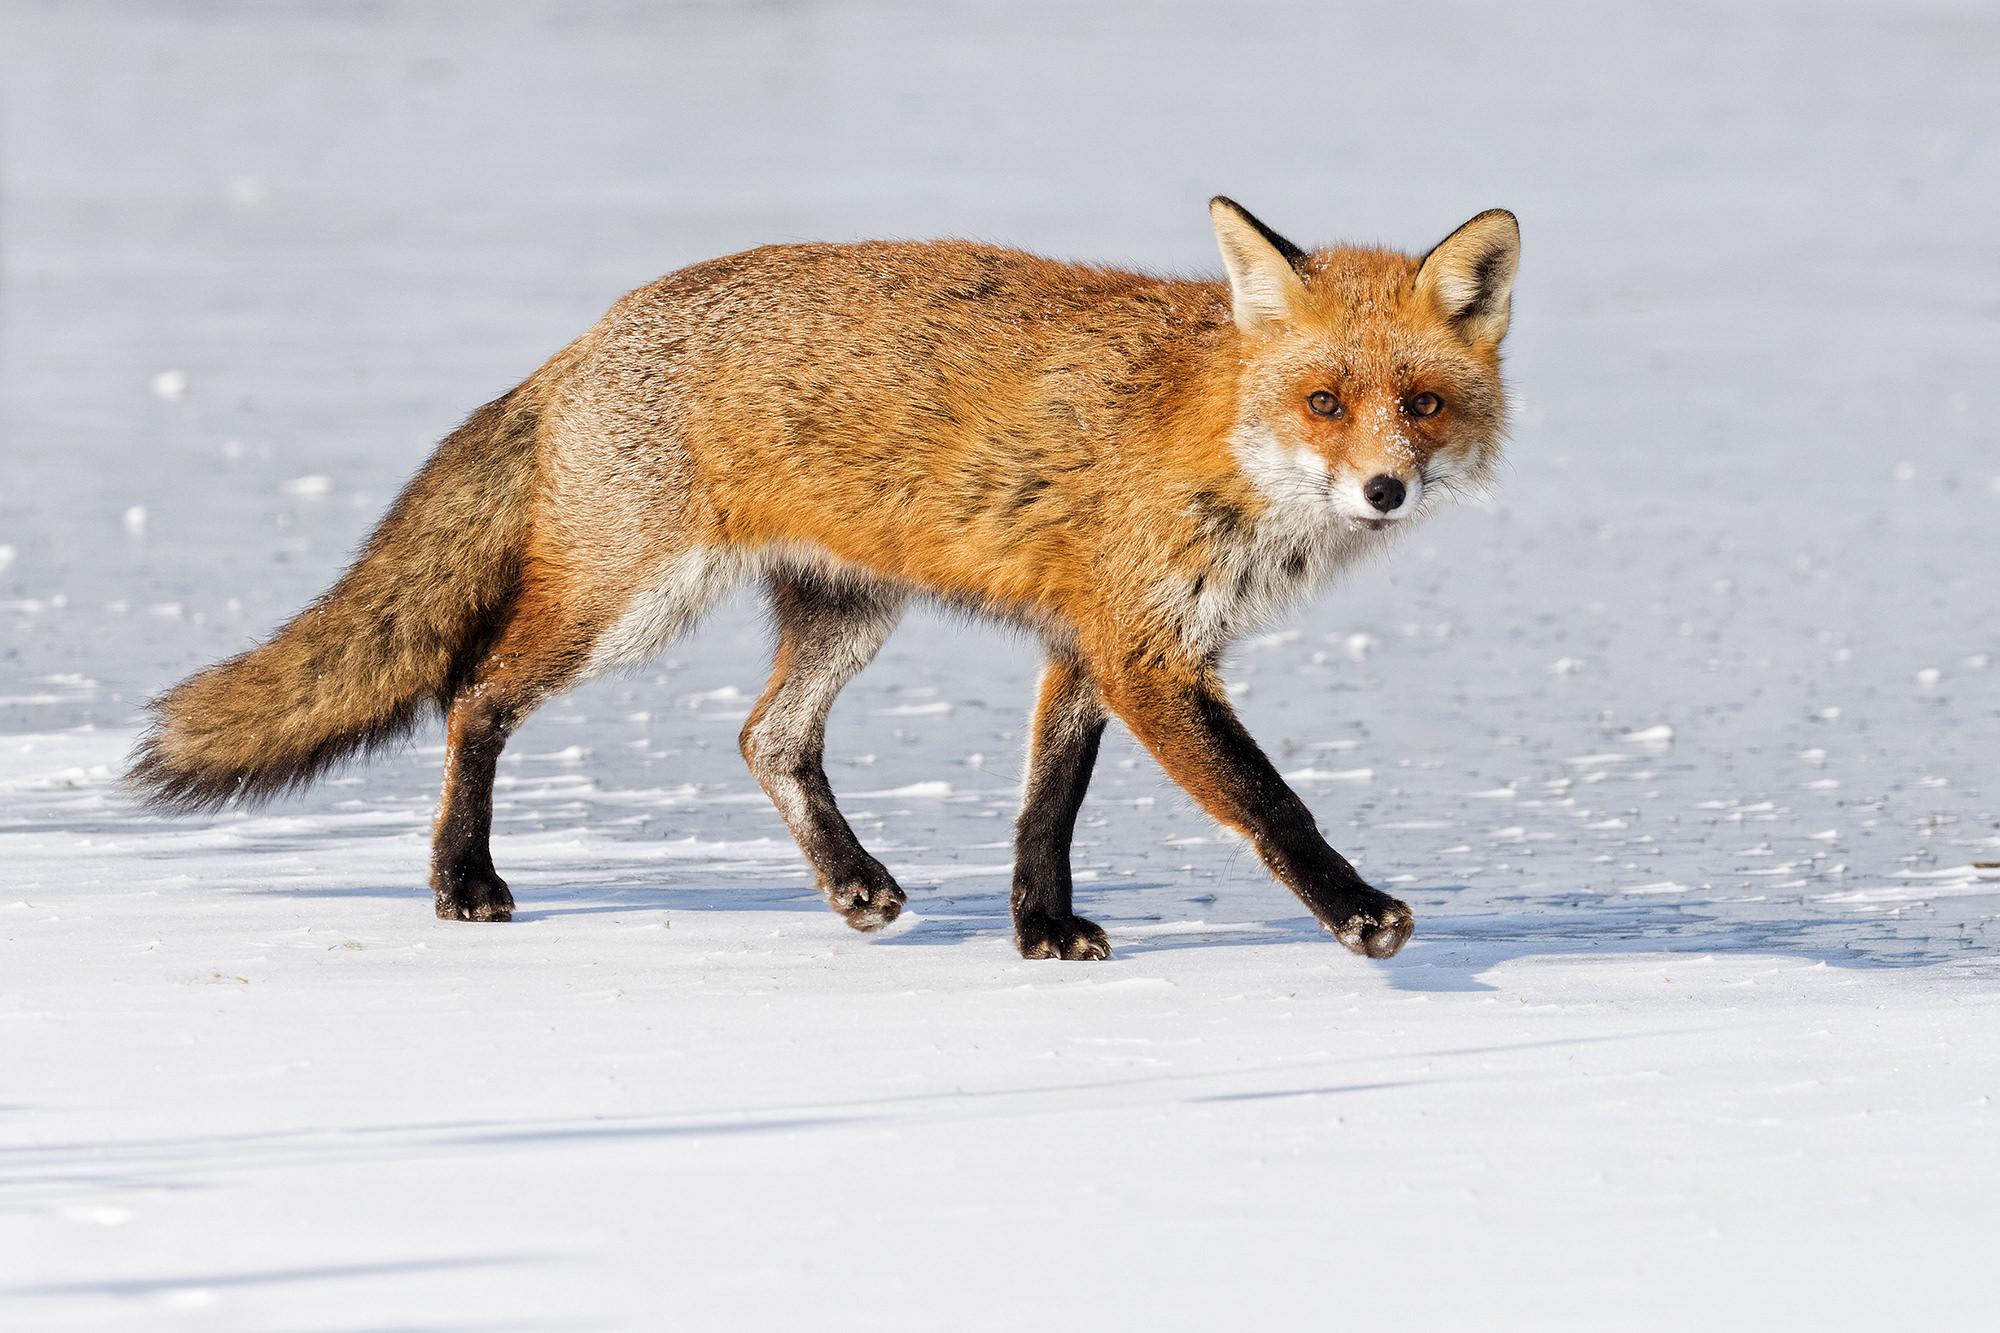 Vörös róka, Red Fox, Rotfuchs, Vulpes vulpes